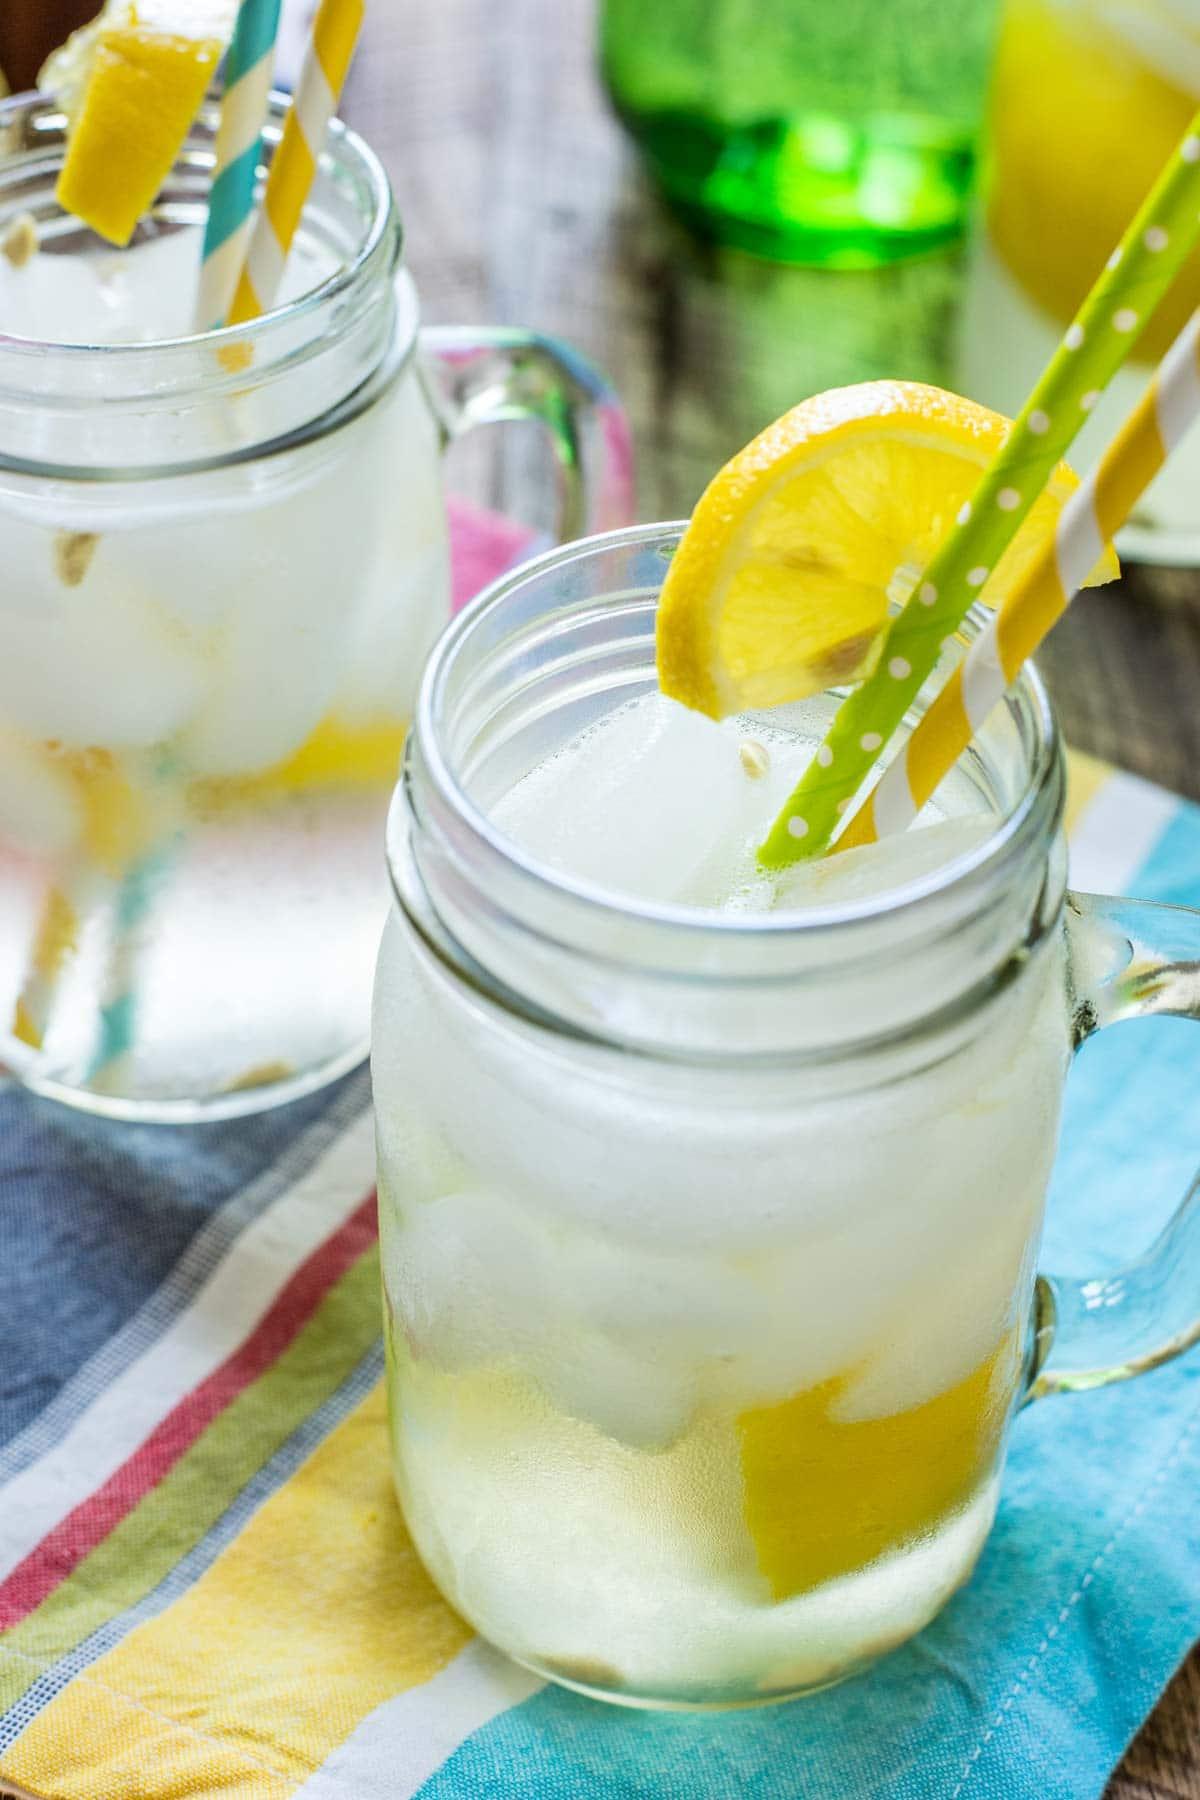 Get the refreshing taste of summer with this Homemade Lemon Shake Up Recipe!